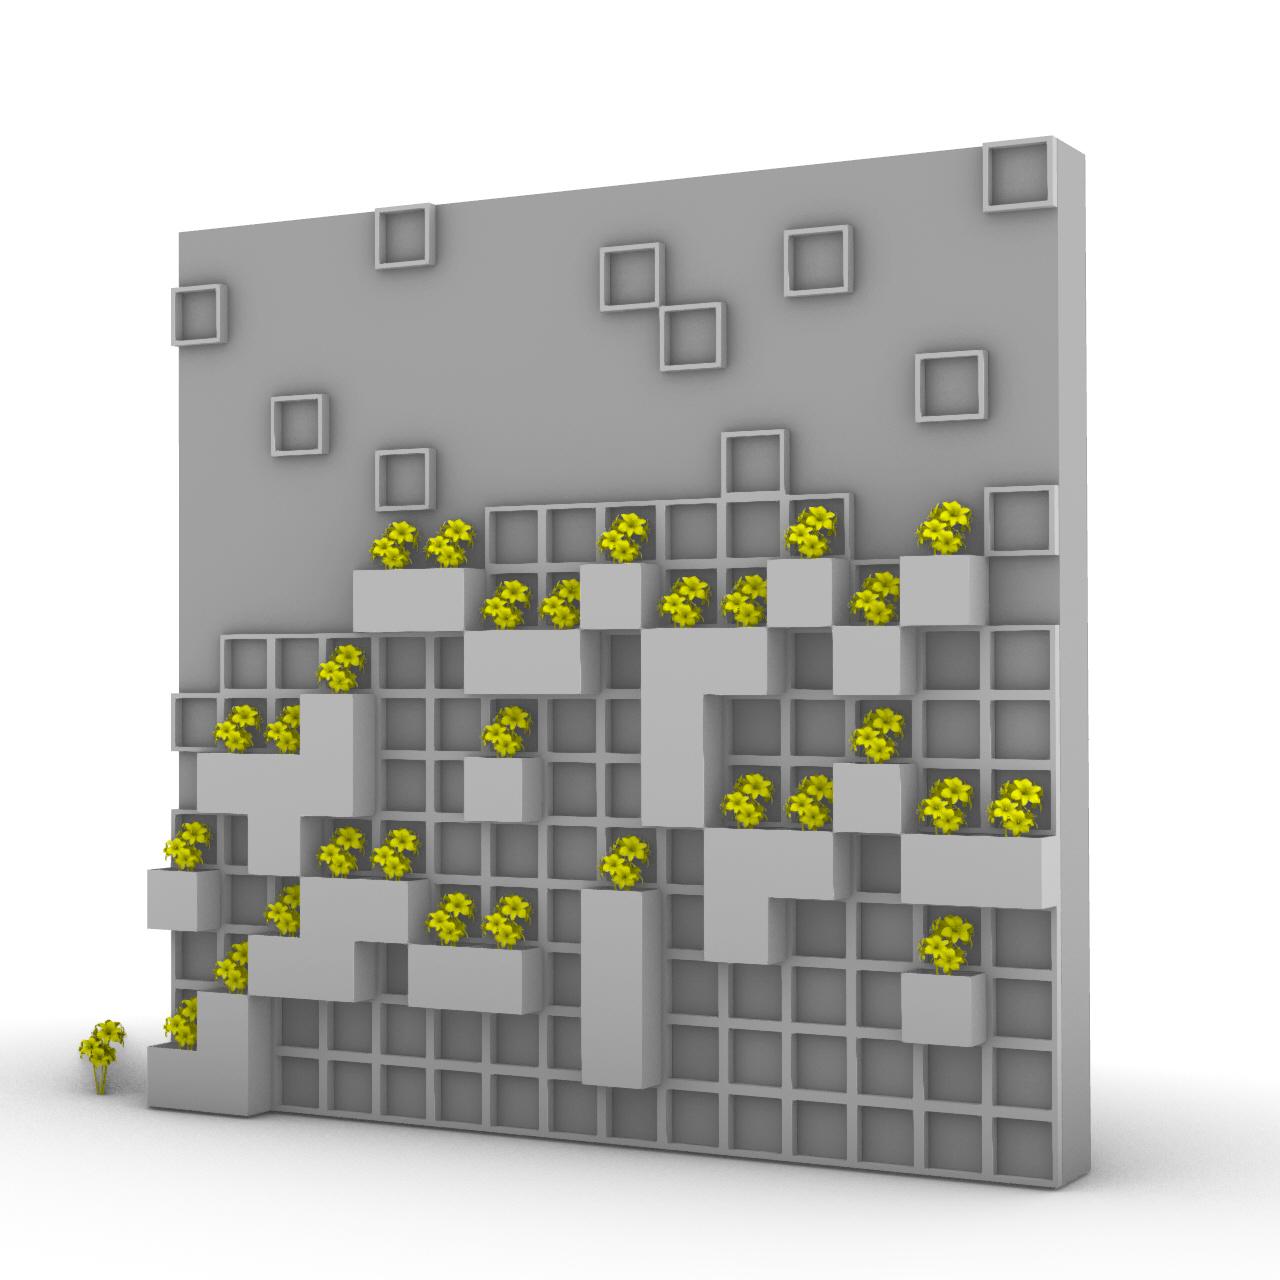 Random Extruded Wall